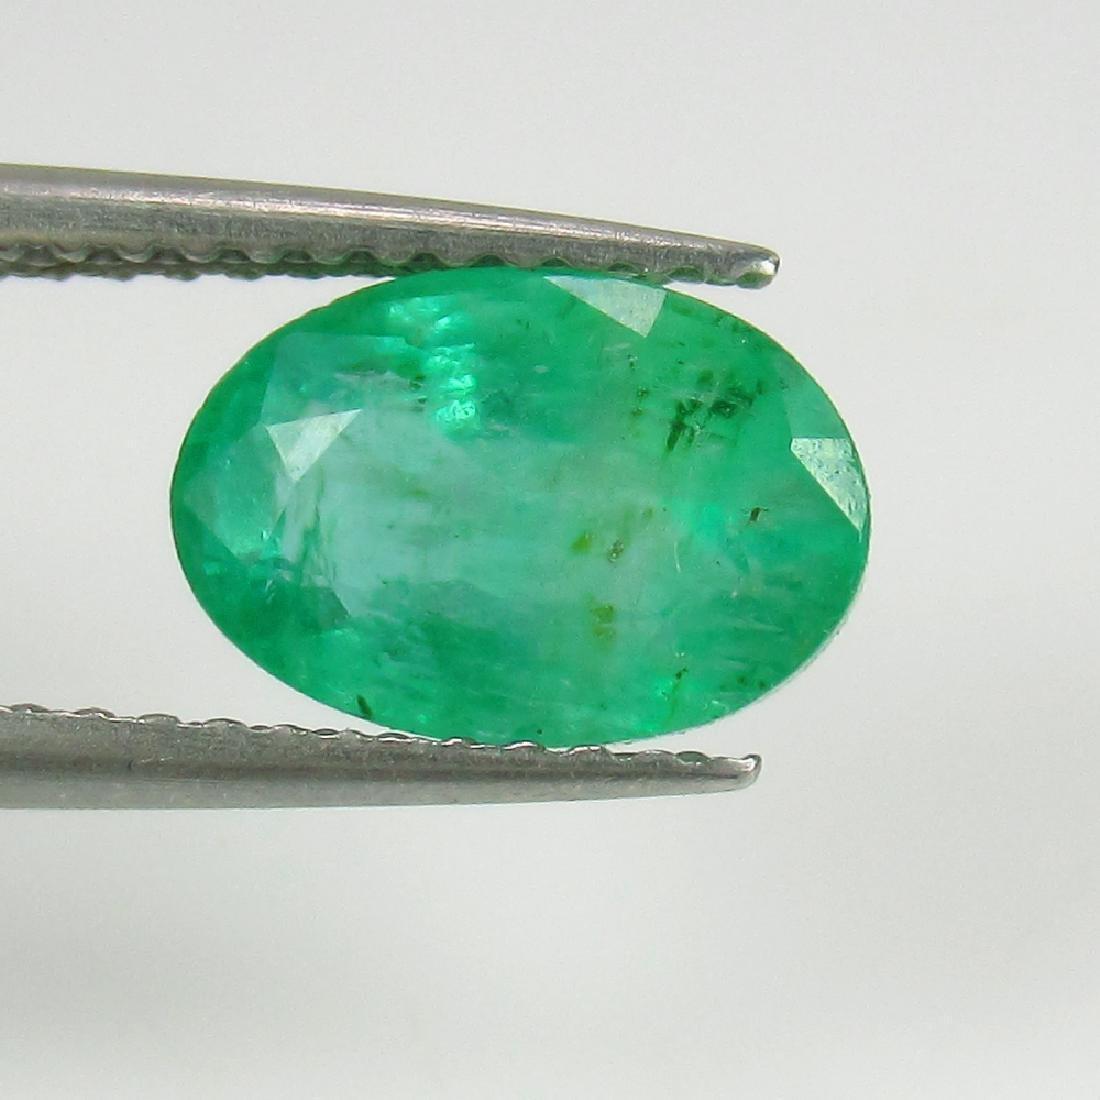 2.06 Ct IGI Certified Genuine Zambian Emerald Nice Oval - 4